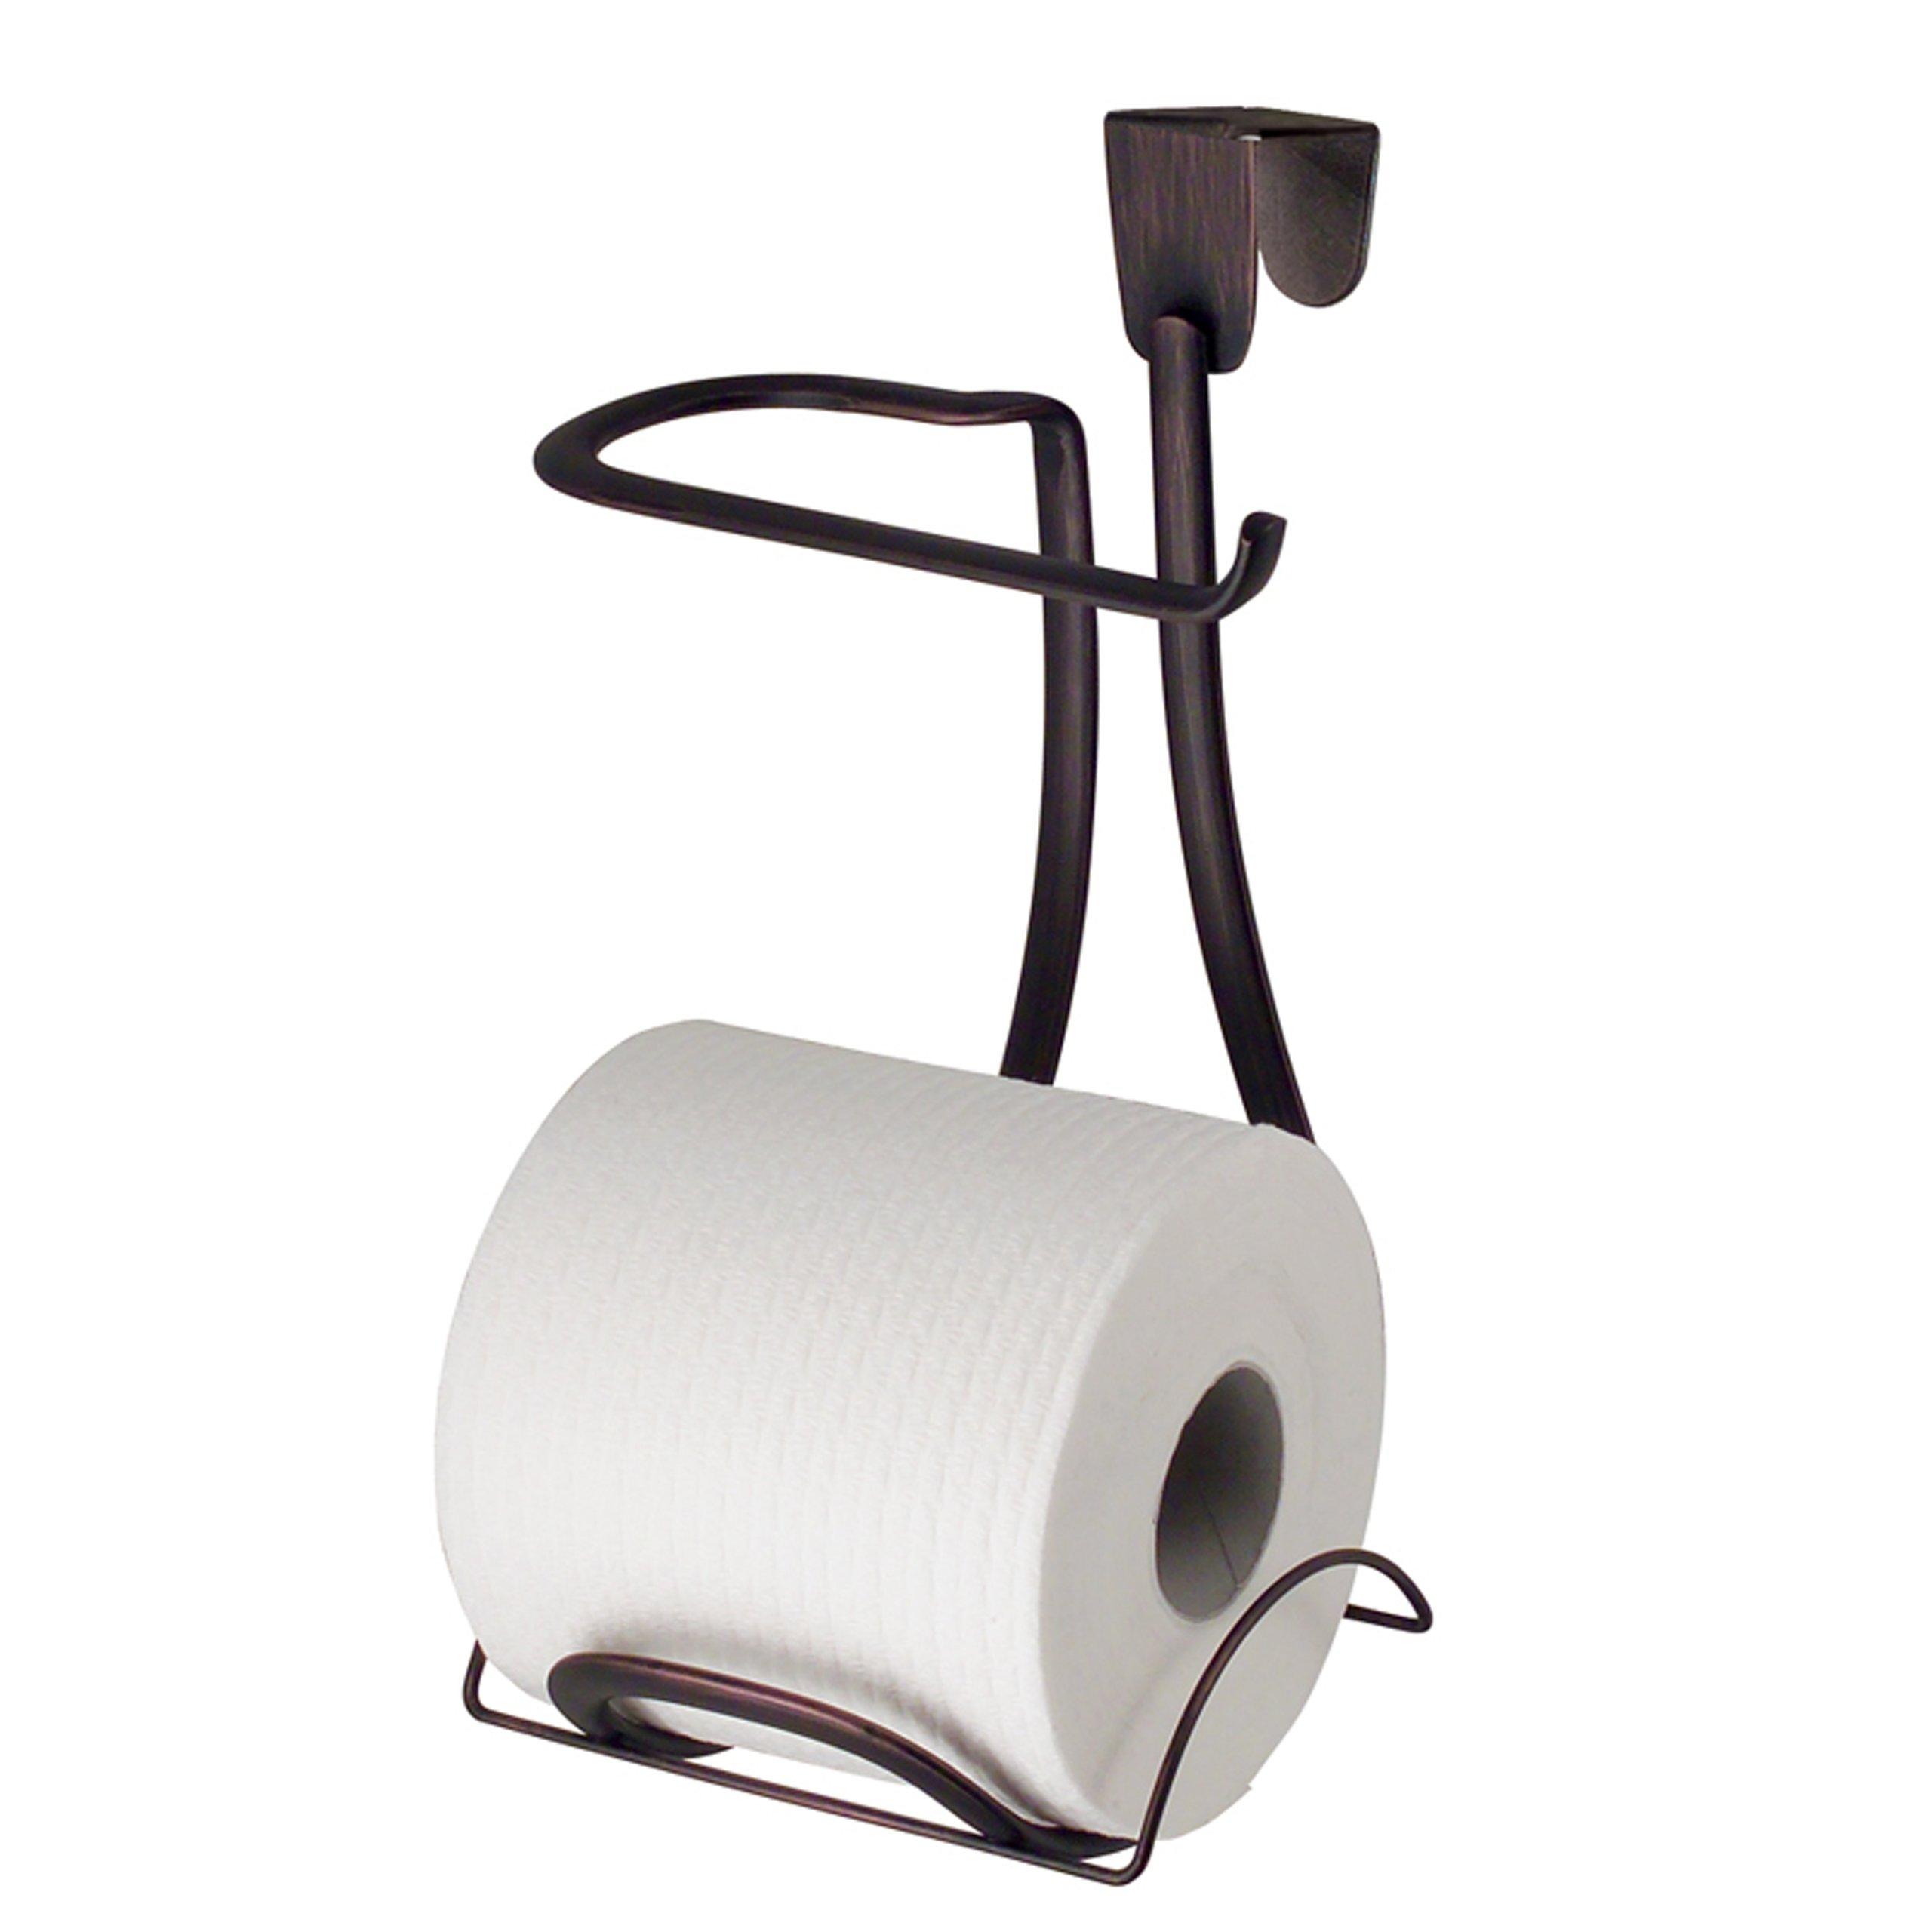 "iDesign Axis Metal Toilet Paper Holder, Over the Tank Tissue Organizer for Bathroom Storage, 6"" x 6.2"" x 11"", Bronze"